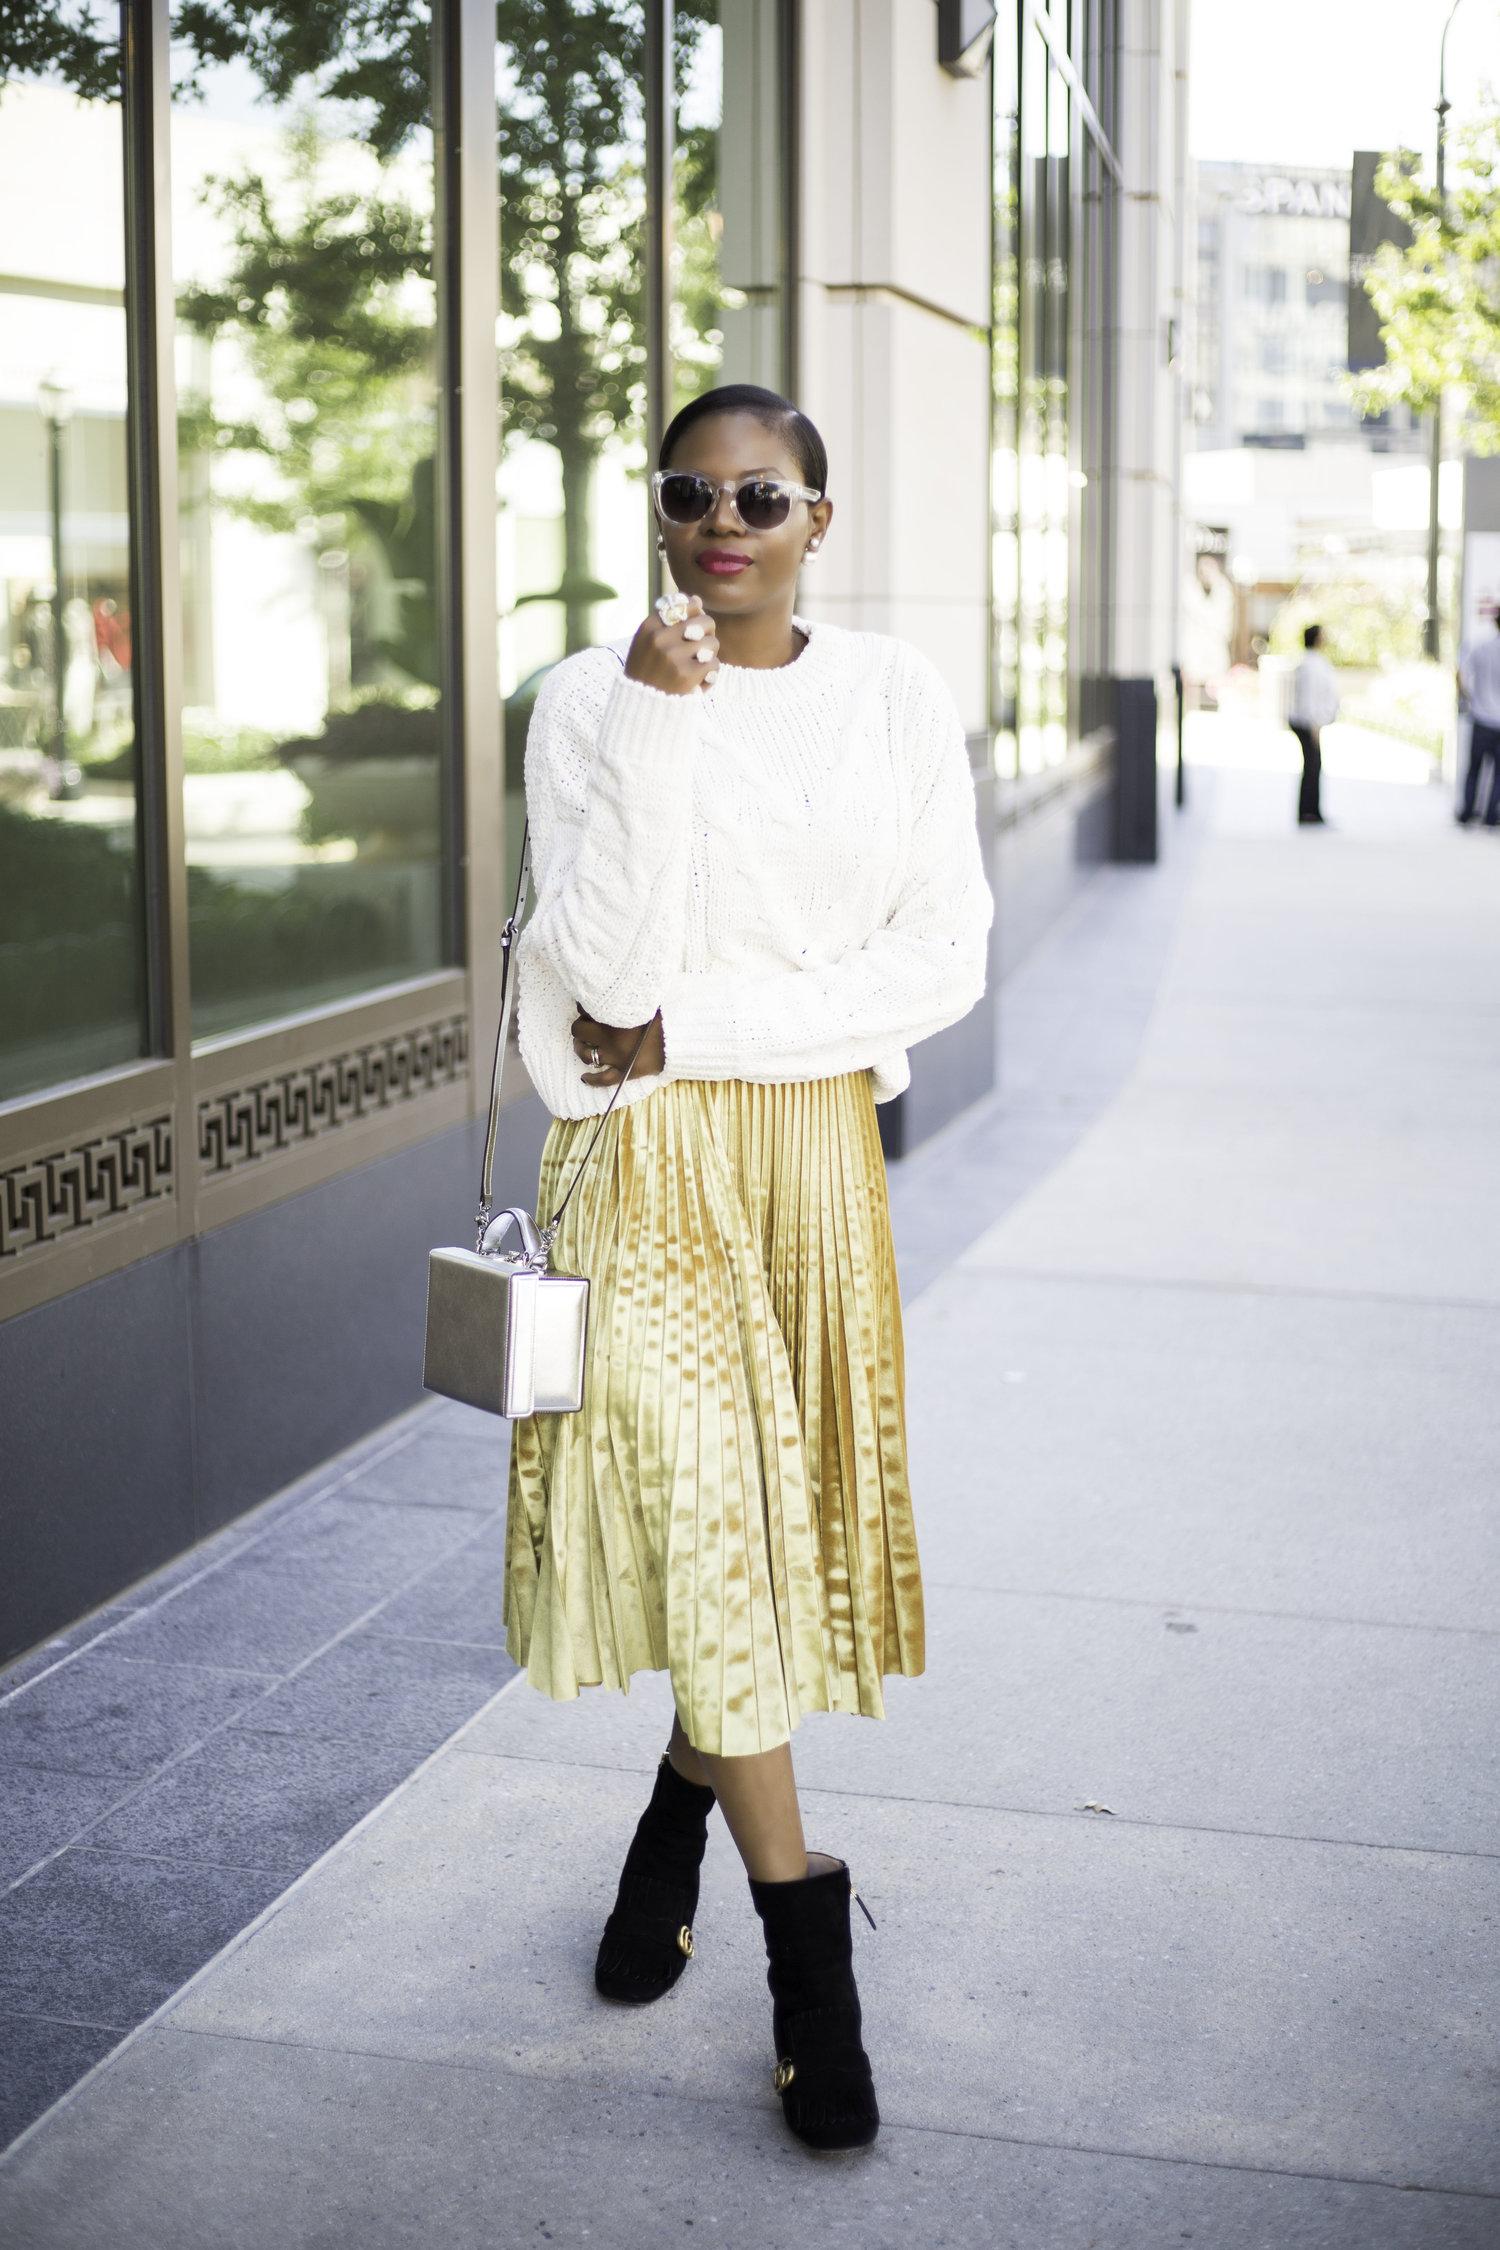 Monica Awe-Etuk, Awed by Monica, Melodie Stewart, The Style Klazit, Atlanta Style Bloggers